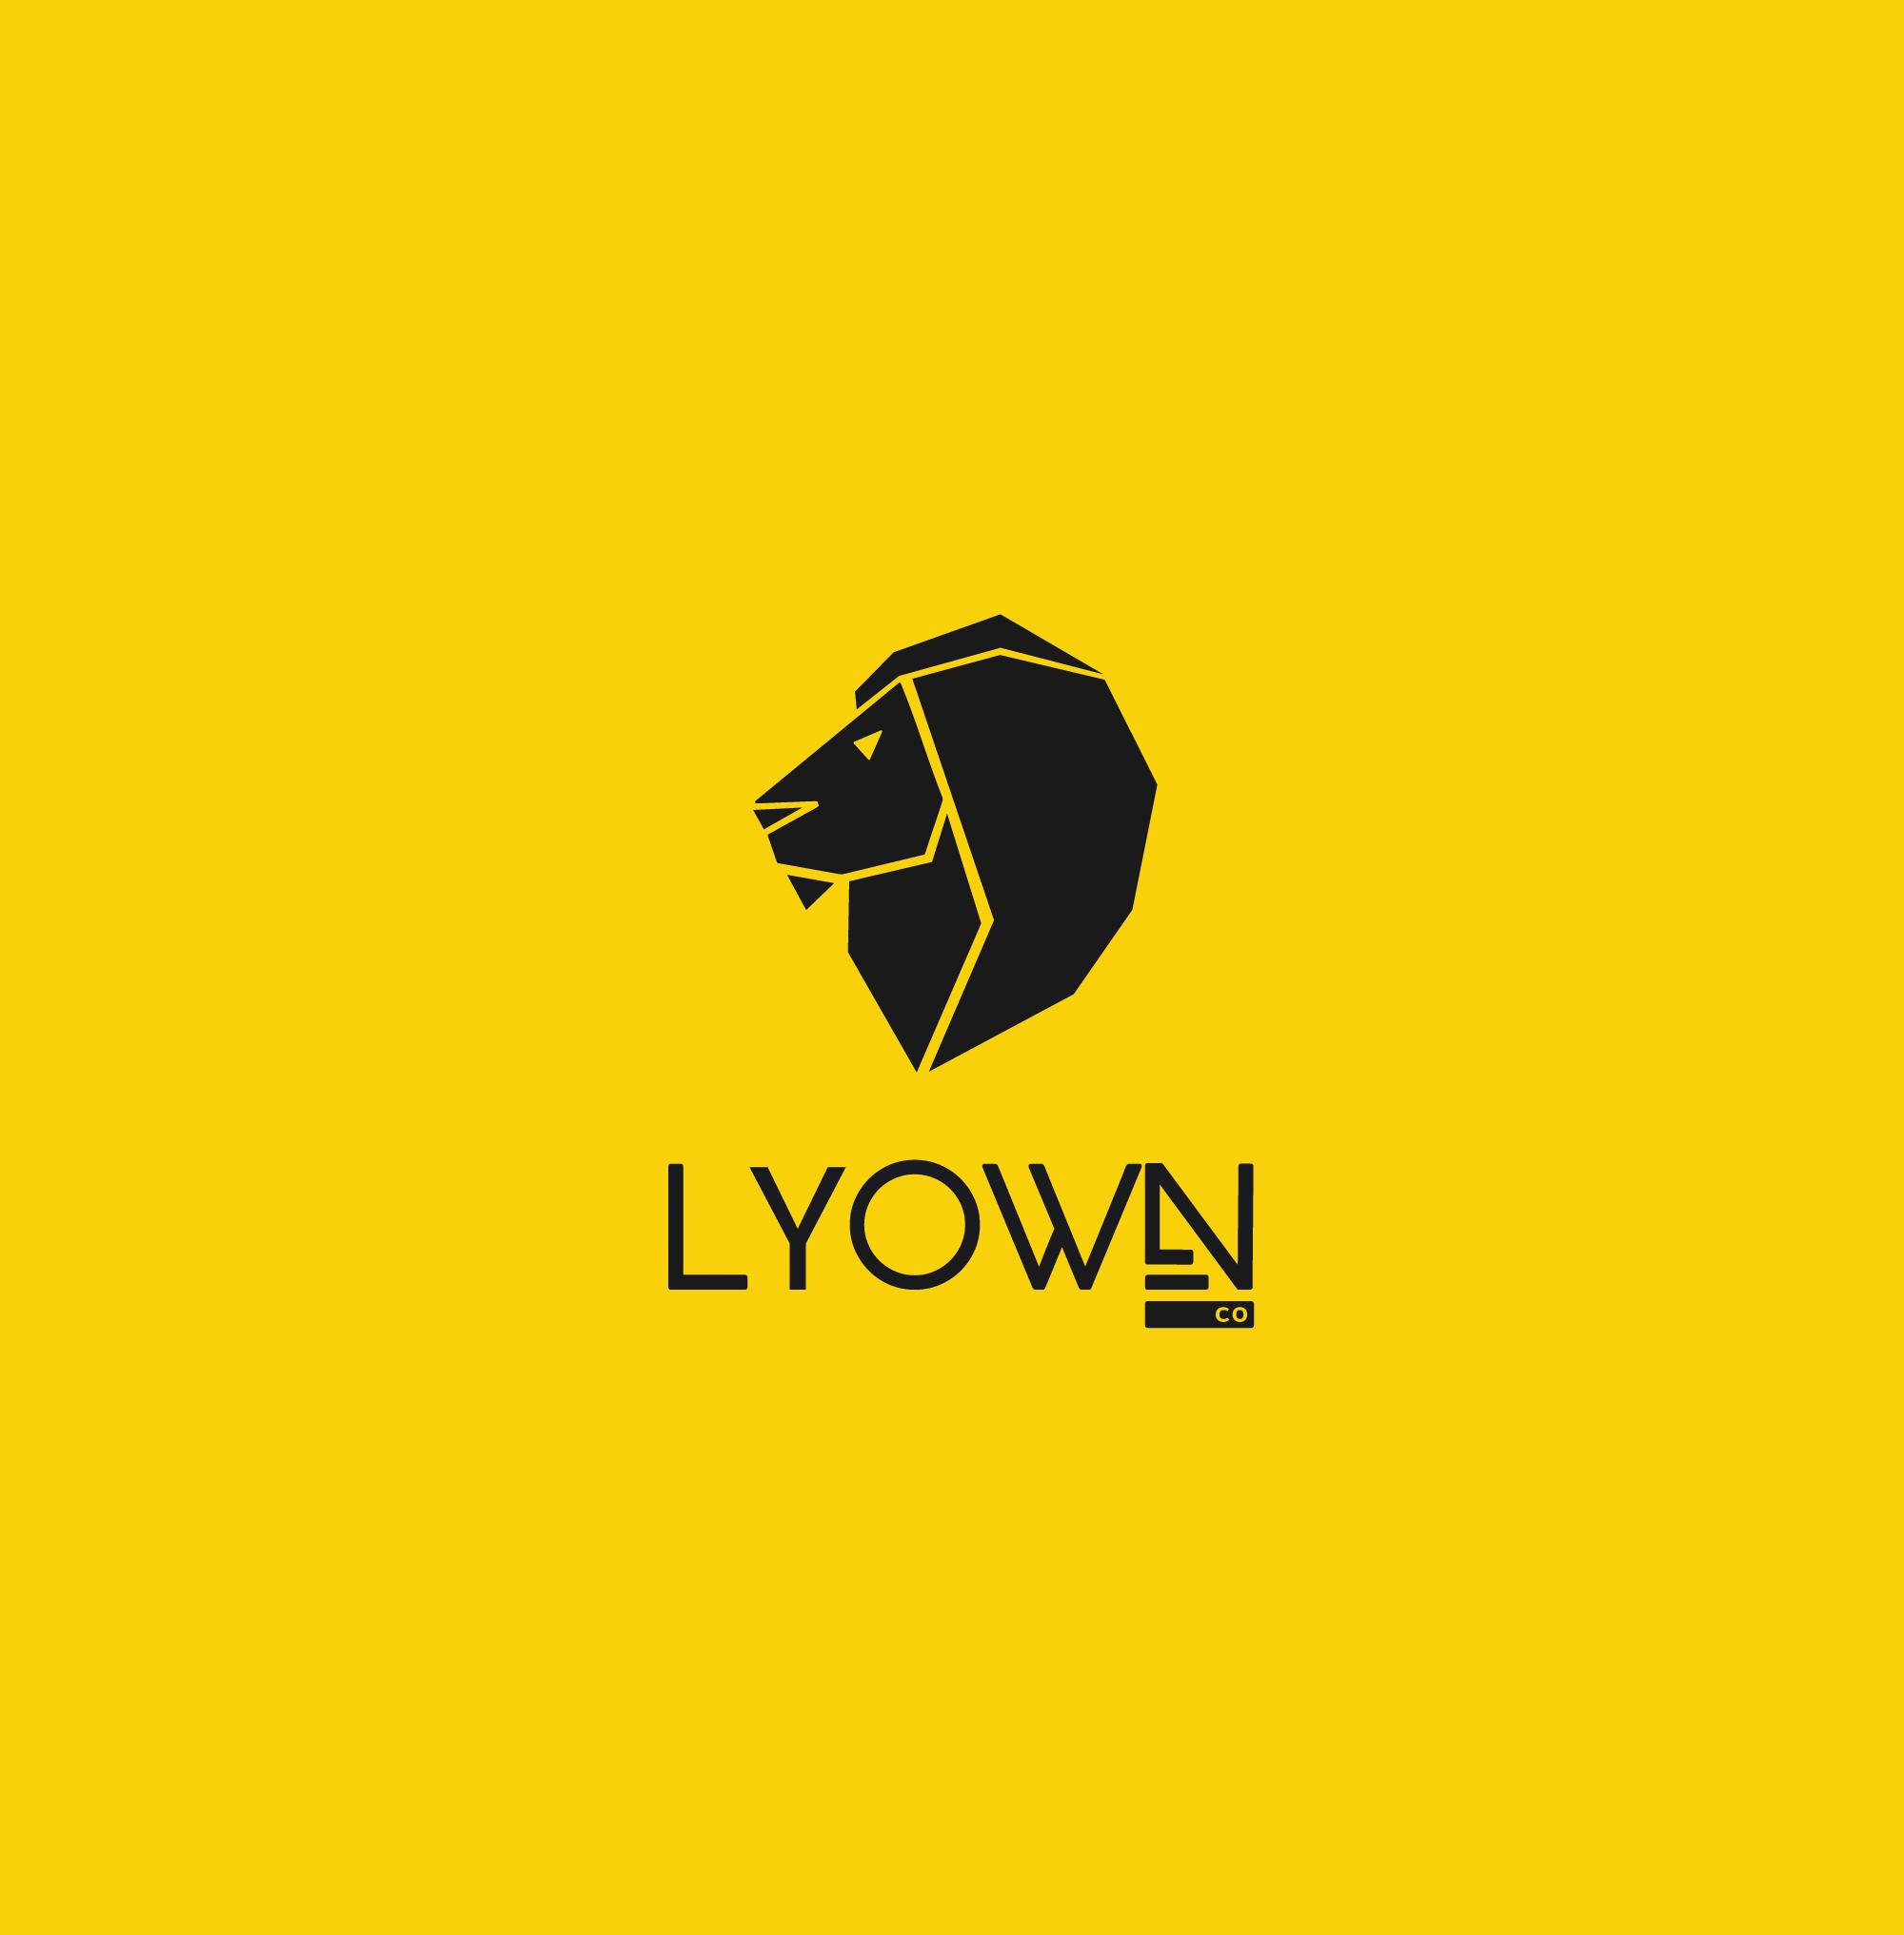 Cliente net2phone - Lyown -